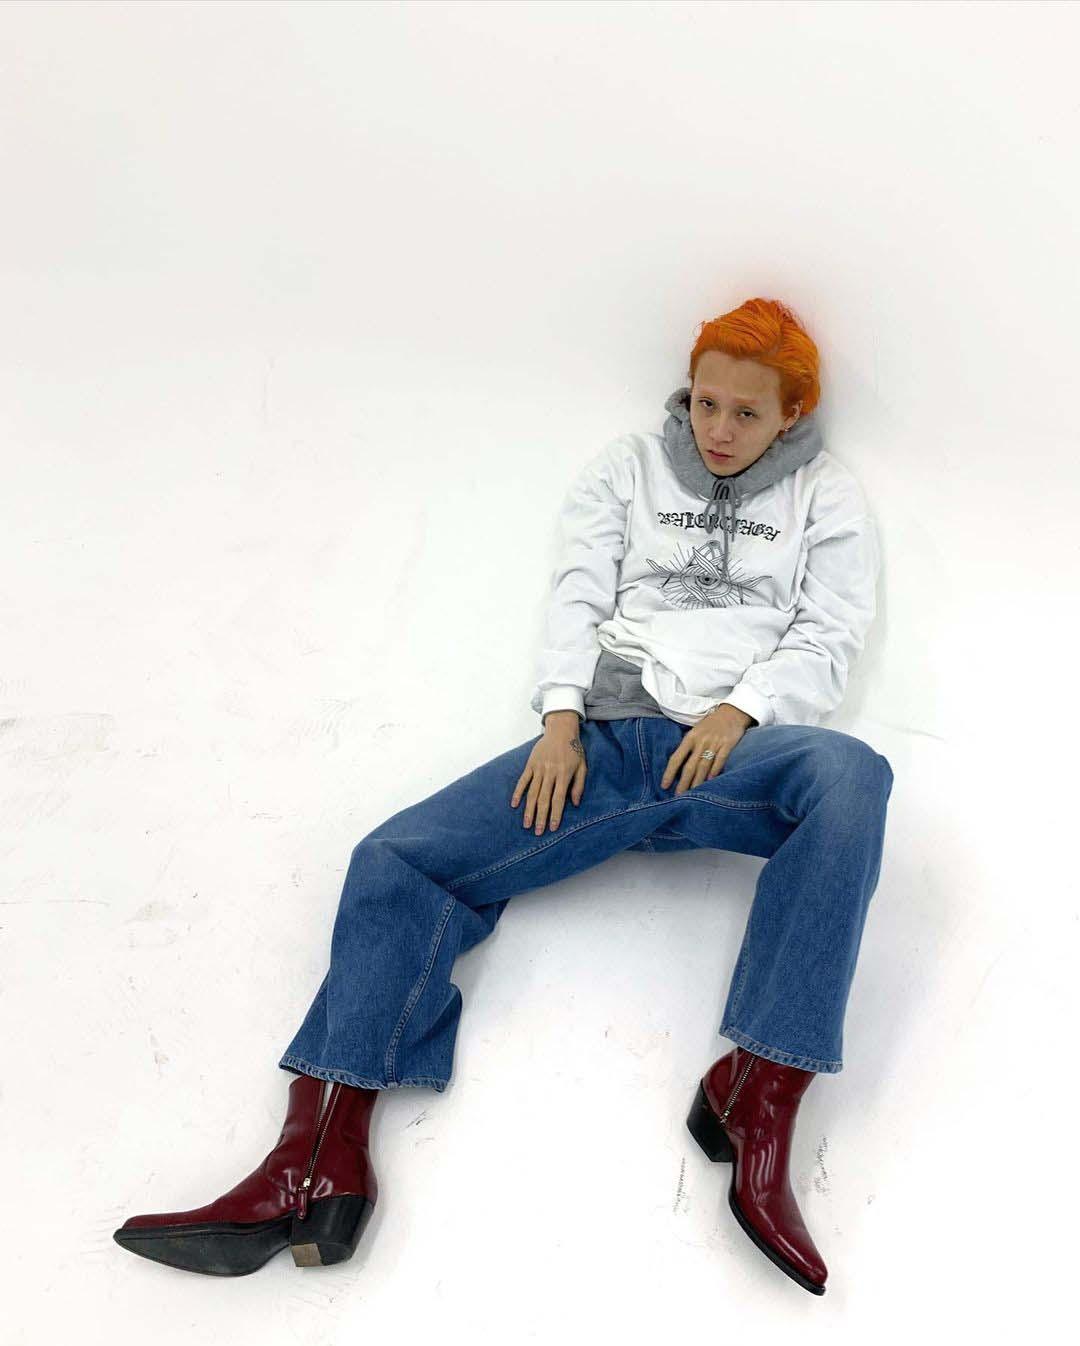 hyo jong e'dawn mặc áo hoodie quần jeans